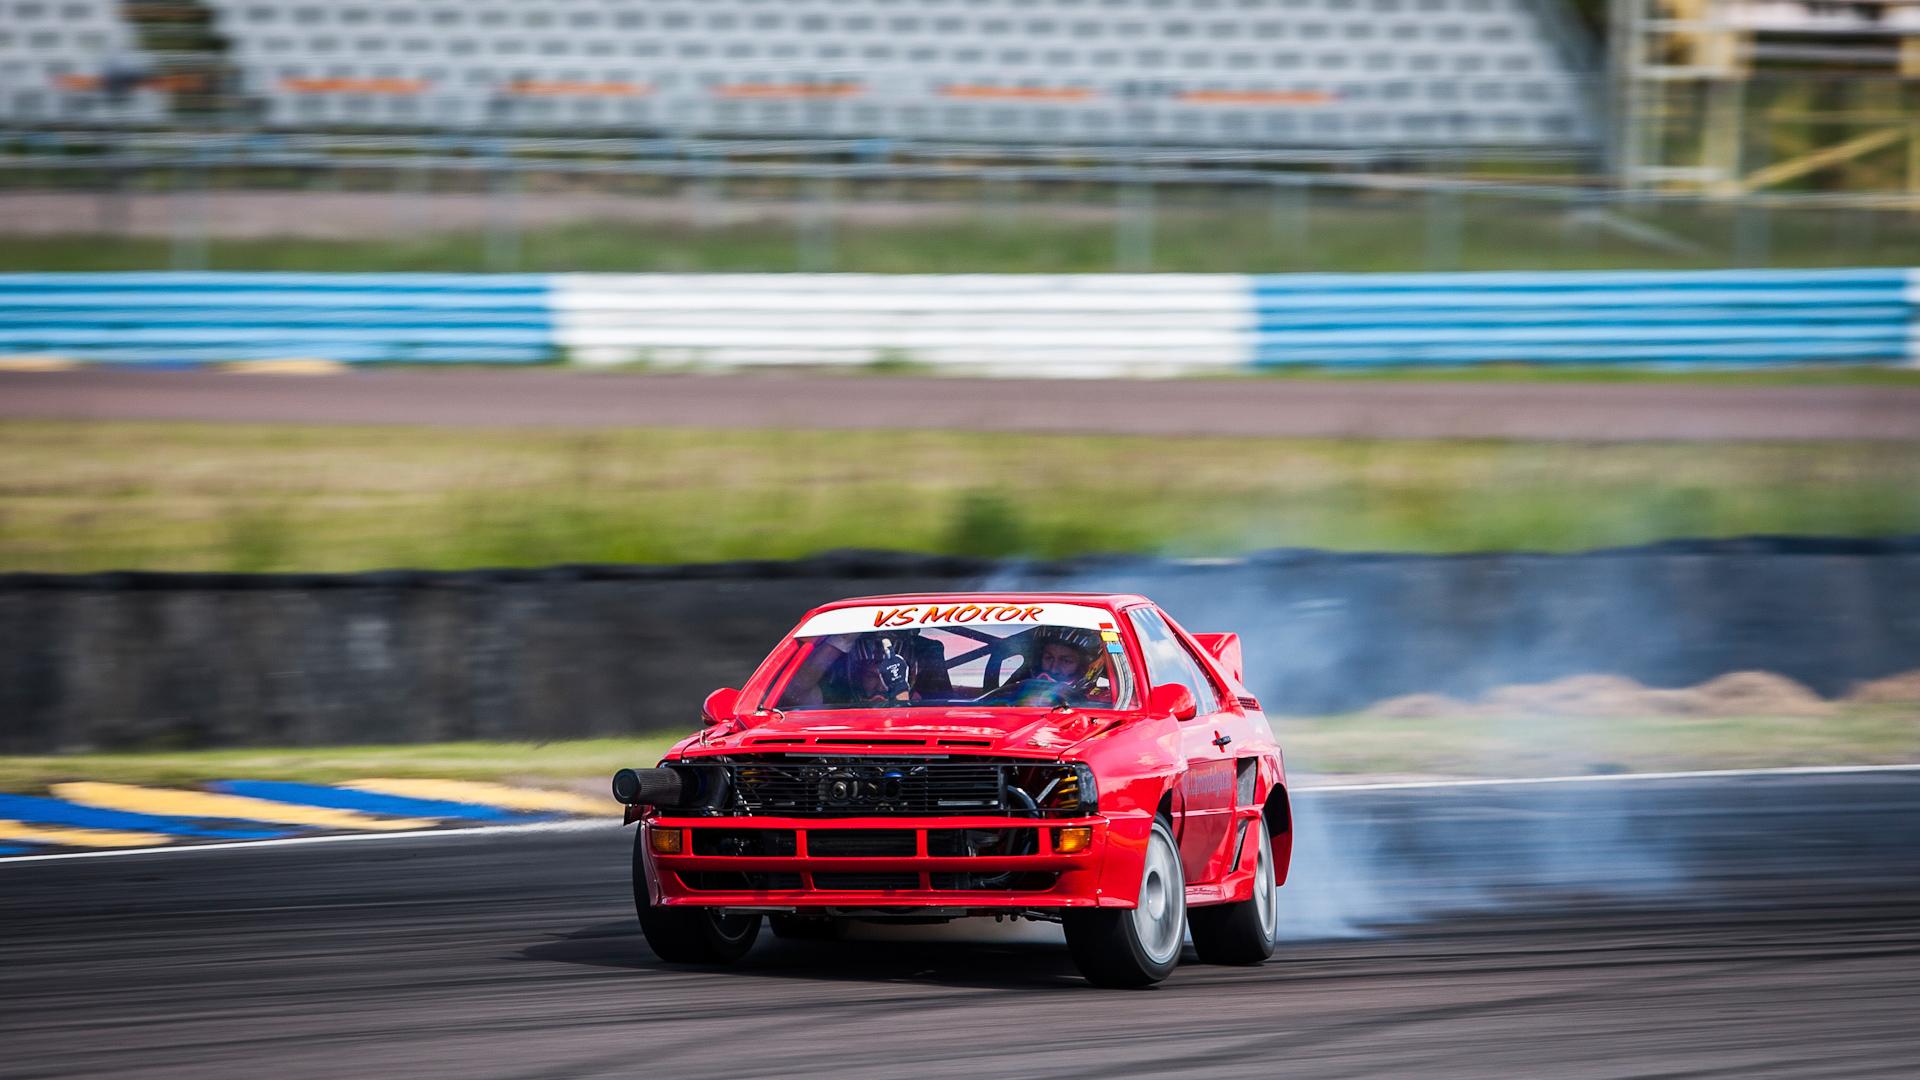 Download Drift Racing Wallpaper Hd Car Wallpapers 1920x1080 69